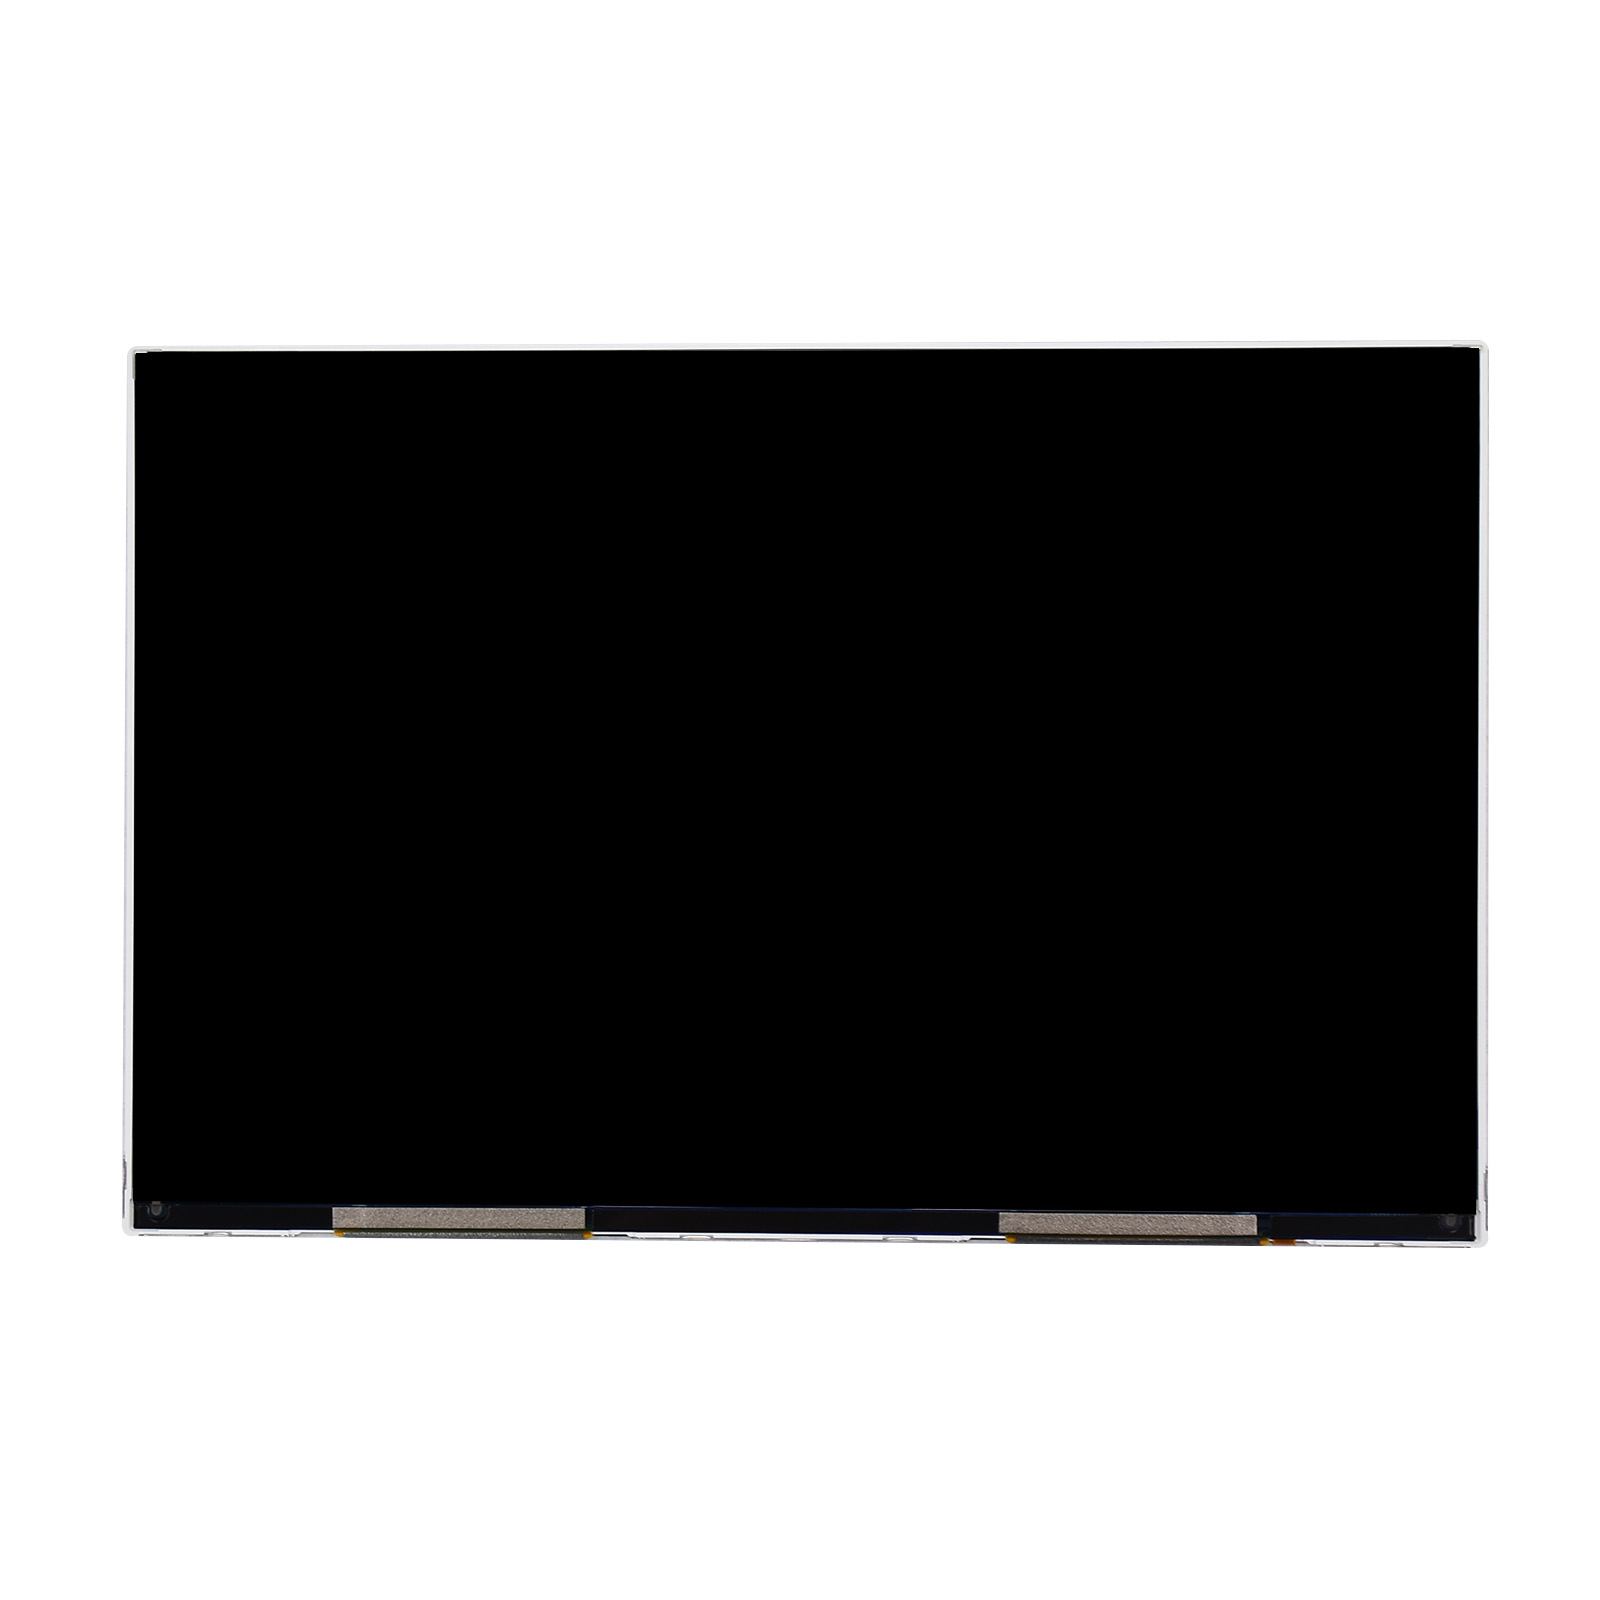 For JDI 8.9 inch TFTMD089030 2K LCD Screen Panel For 3D Printer Screen